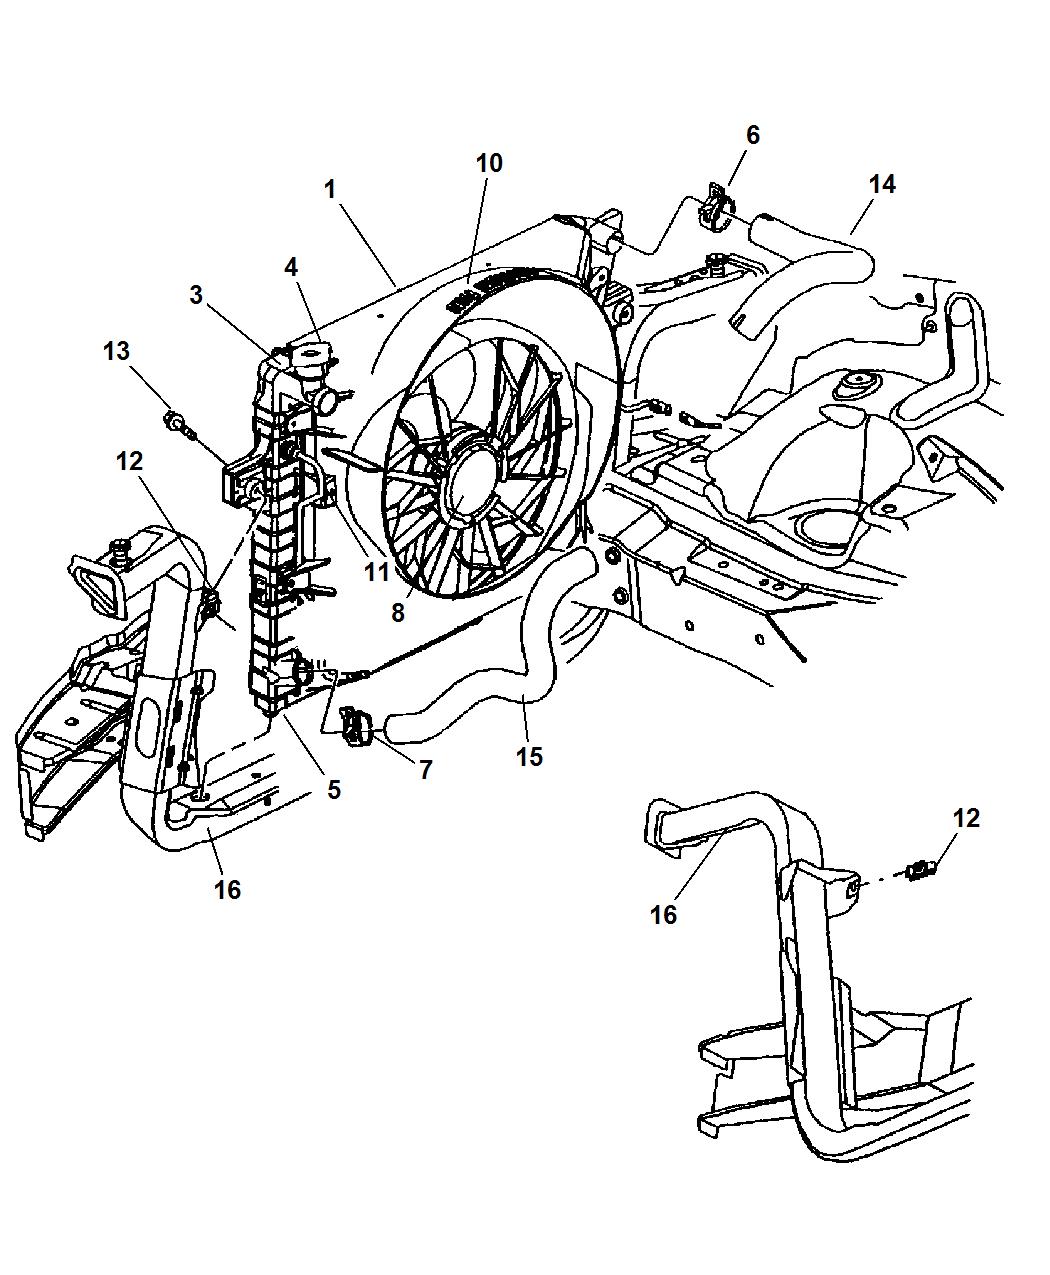 XE_2889] 2004 Jeep Grand Cherokee Parts Diagram Images Schematic WiringInifo Unre Tomy Opein Menia Nedly Benkeme Mohammedshrine Librar Wiring 101